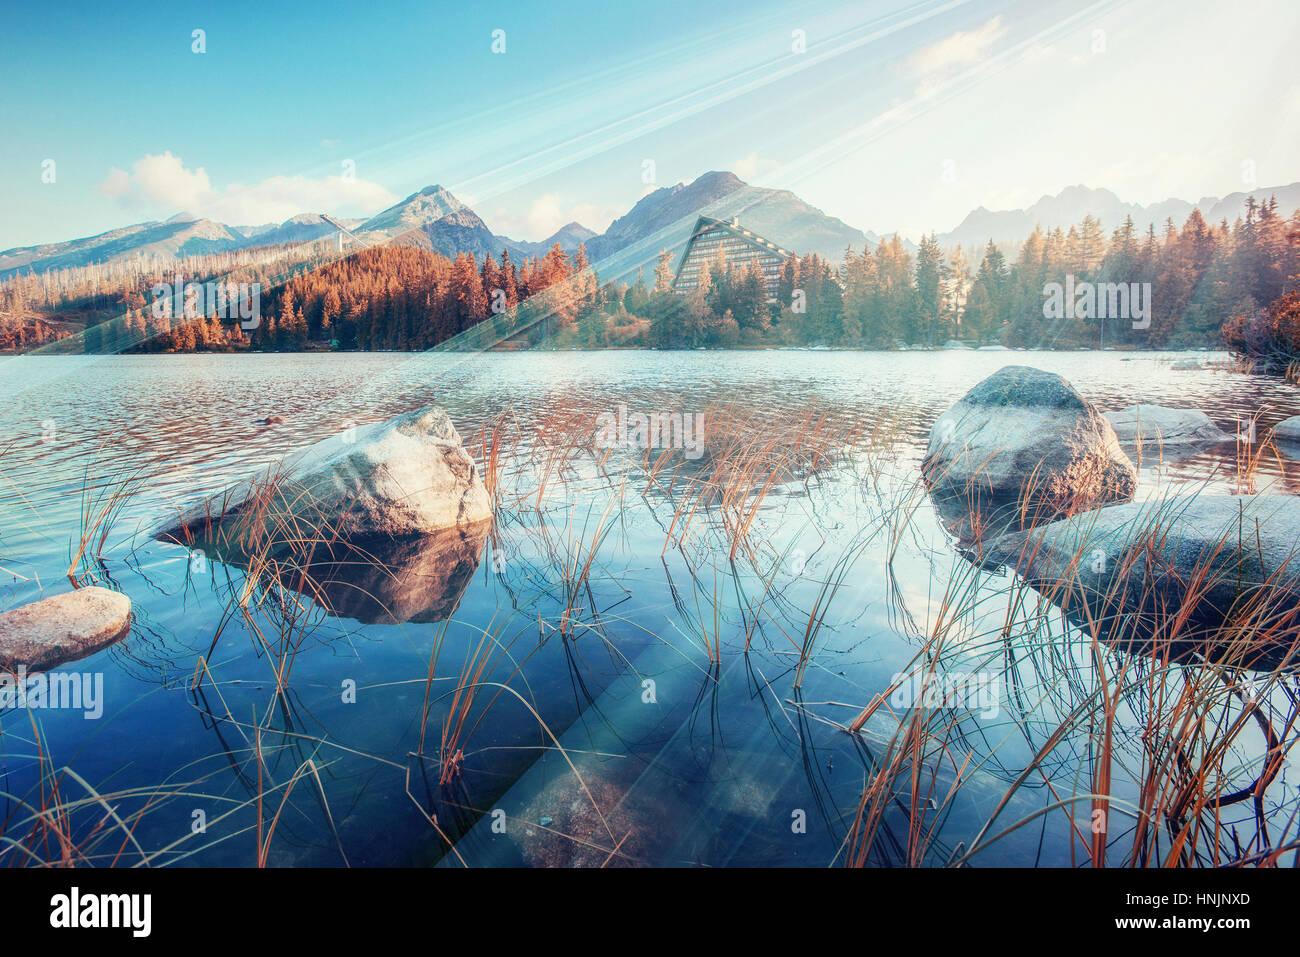 Majestic mountain lake in National Park High Tatra. Strbske ples - Stock Image